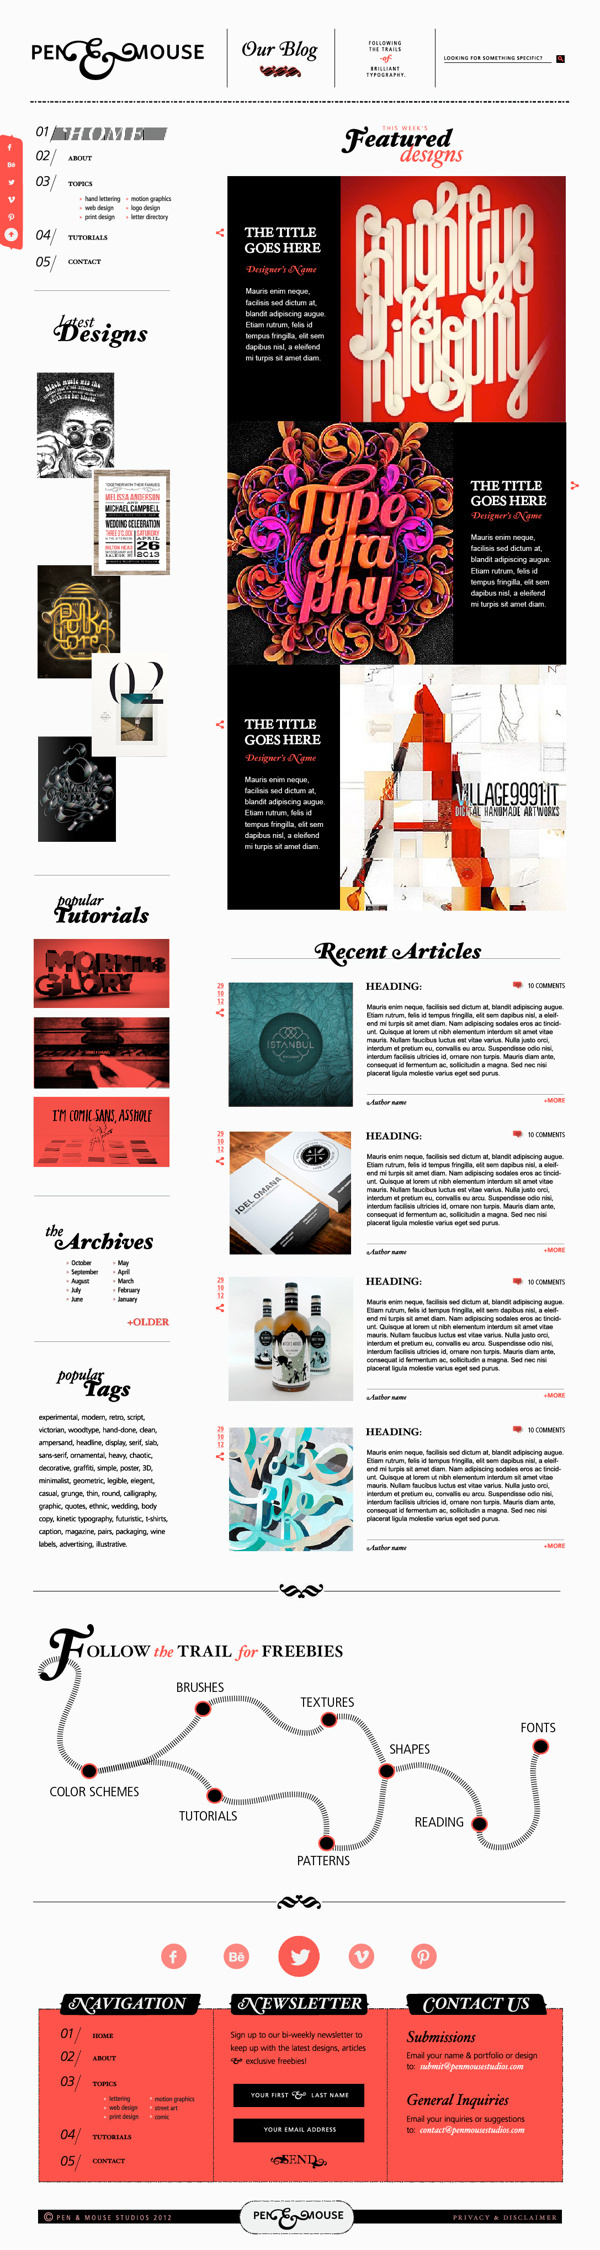 Pen&Mouse - Personal Branding #design #website #blog #layout #web #typography